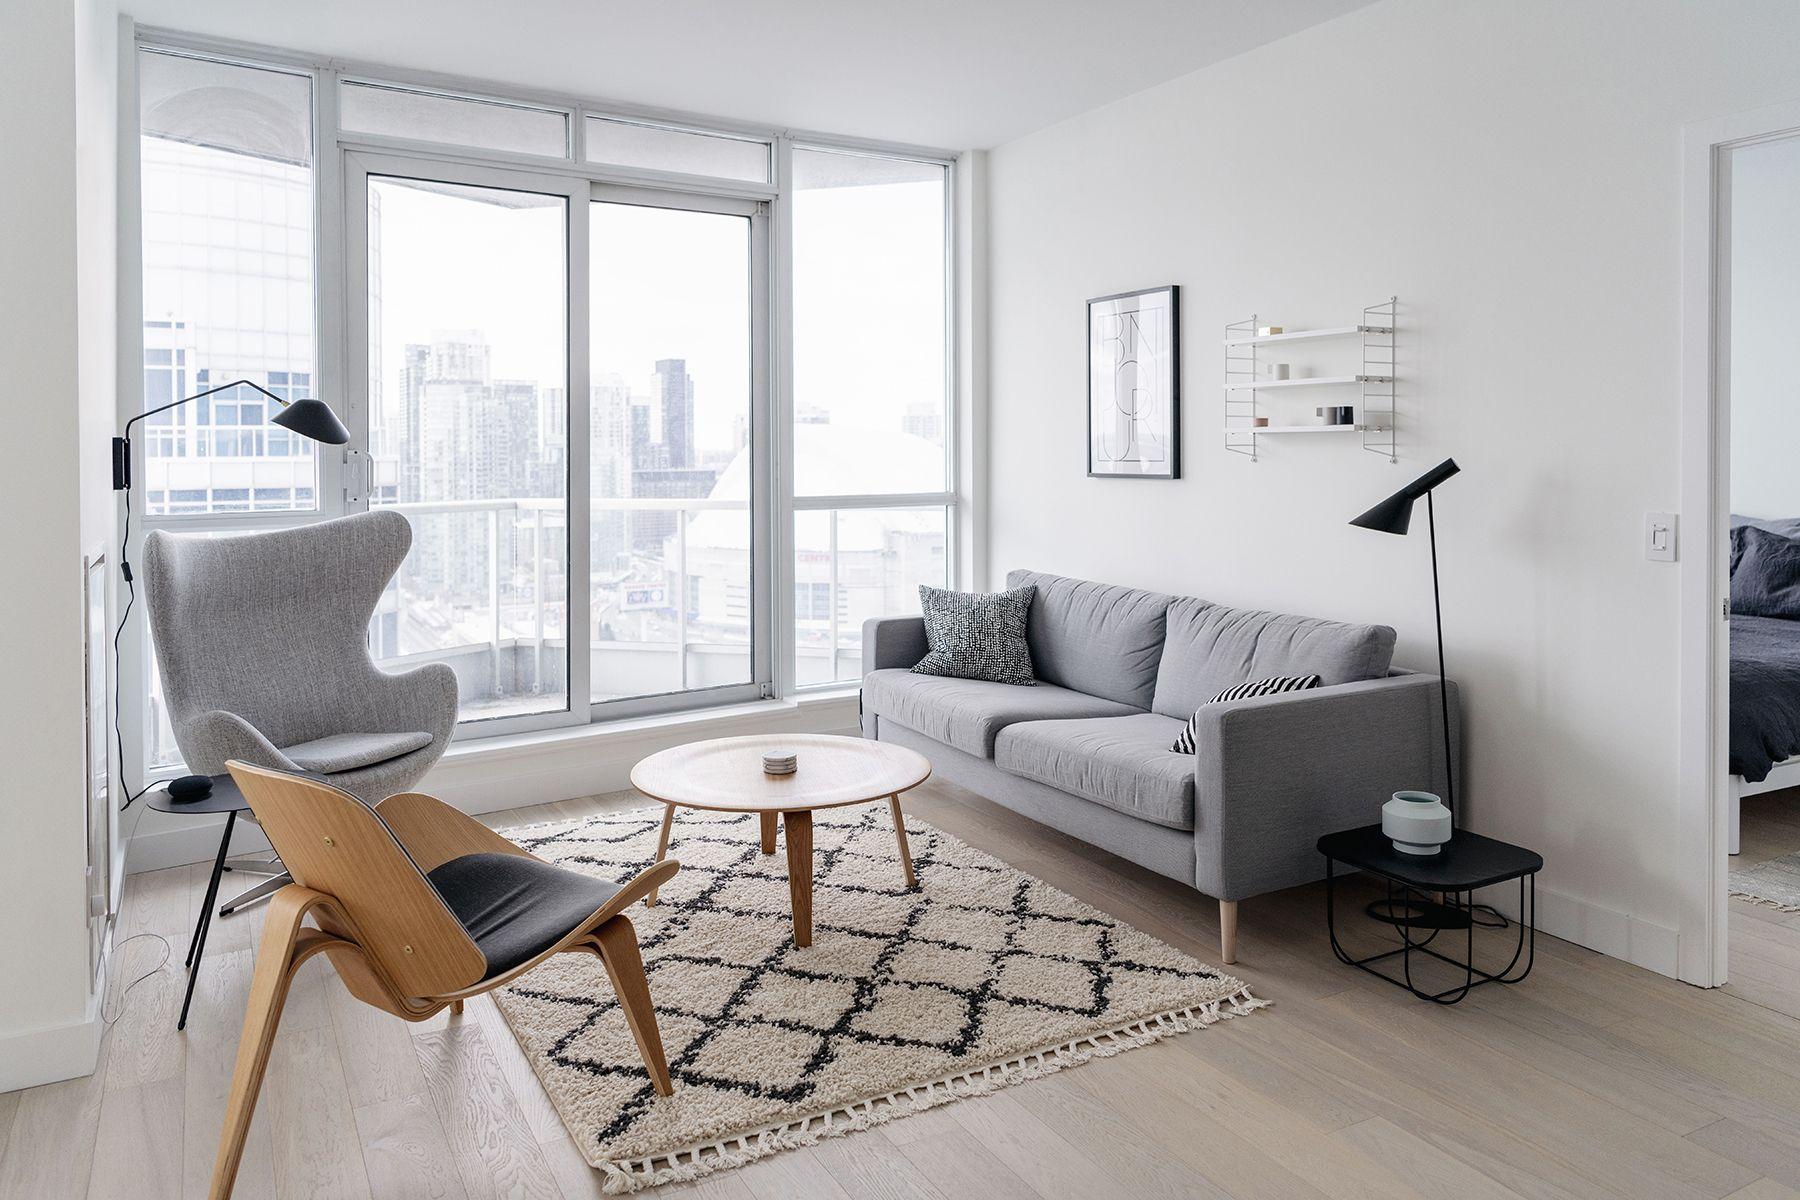 Condo Living Room Tour A Bright Minimalist Space Happy